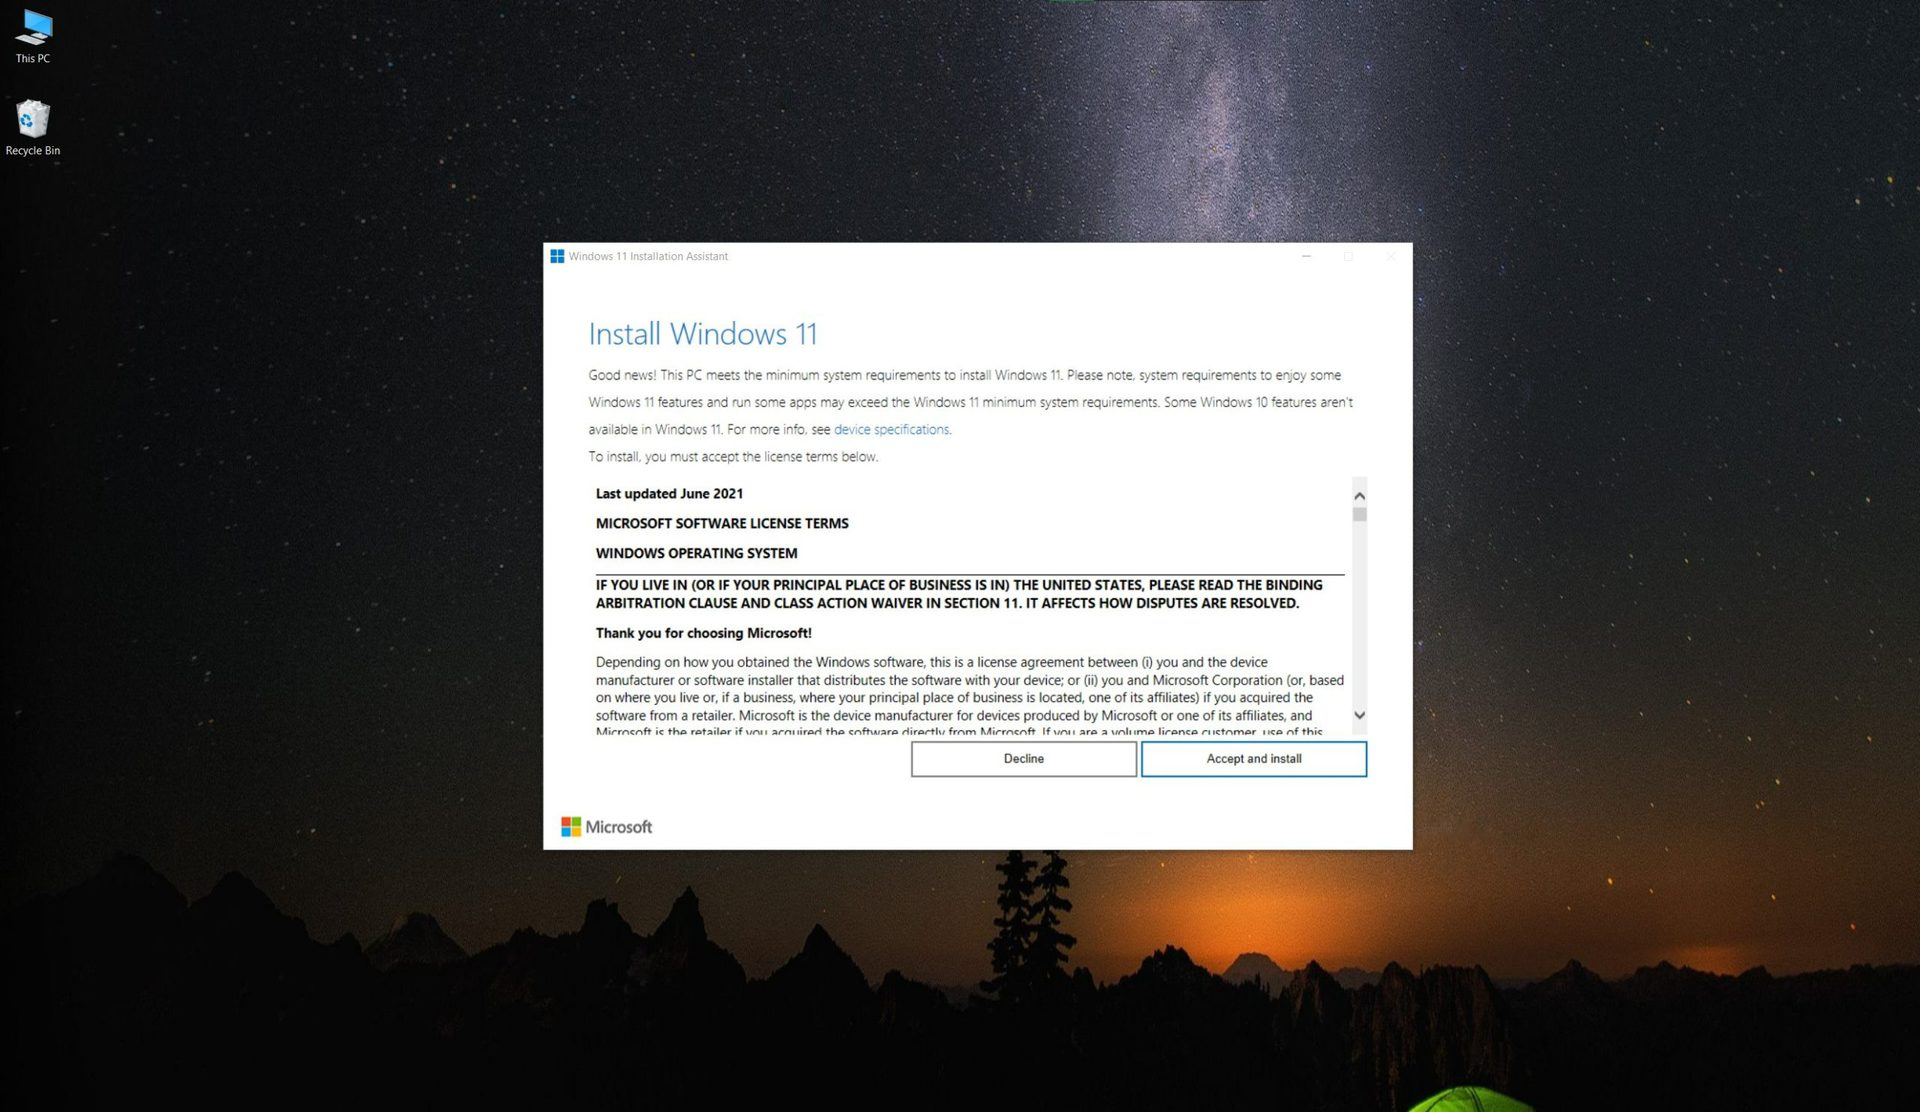 Windows 11 installation assistant license